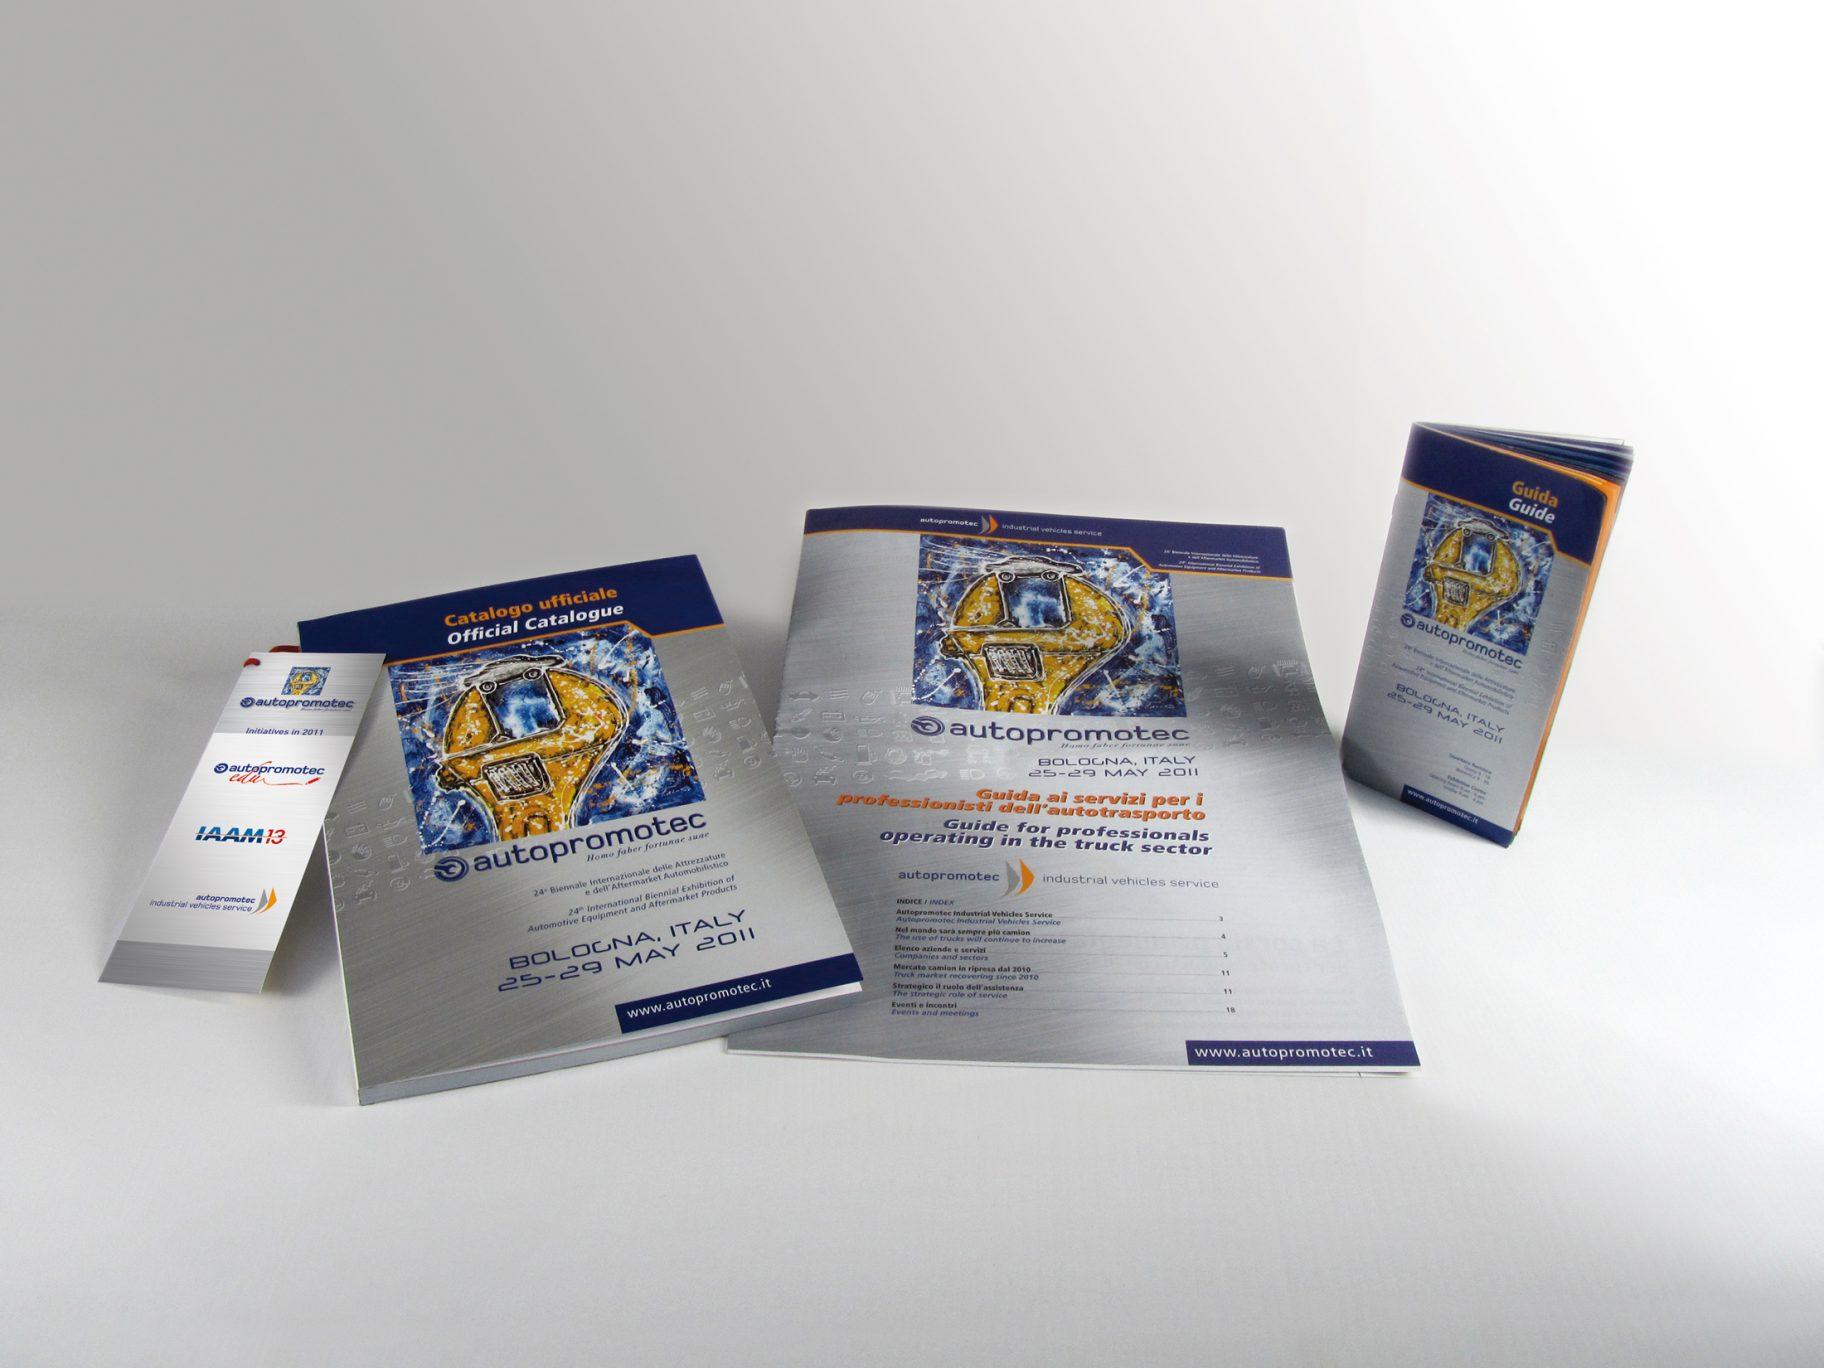 Autopromotec-fiera-2011-pubblicazioni